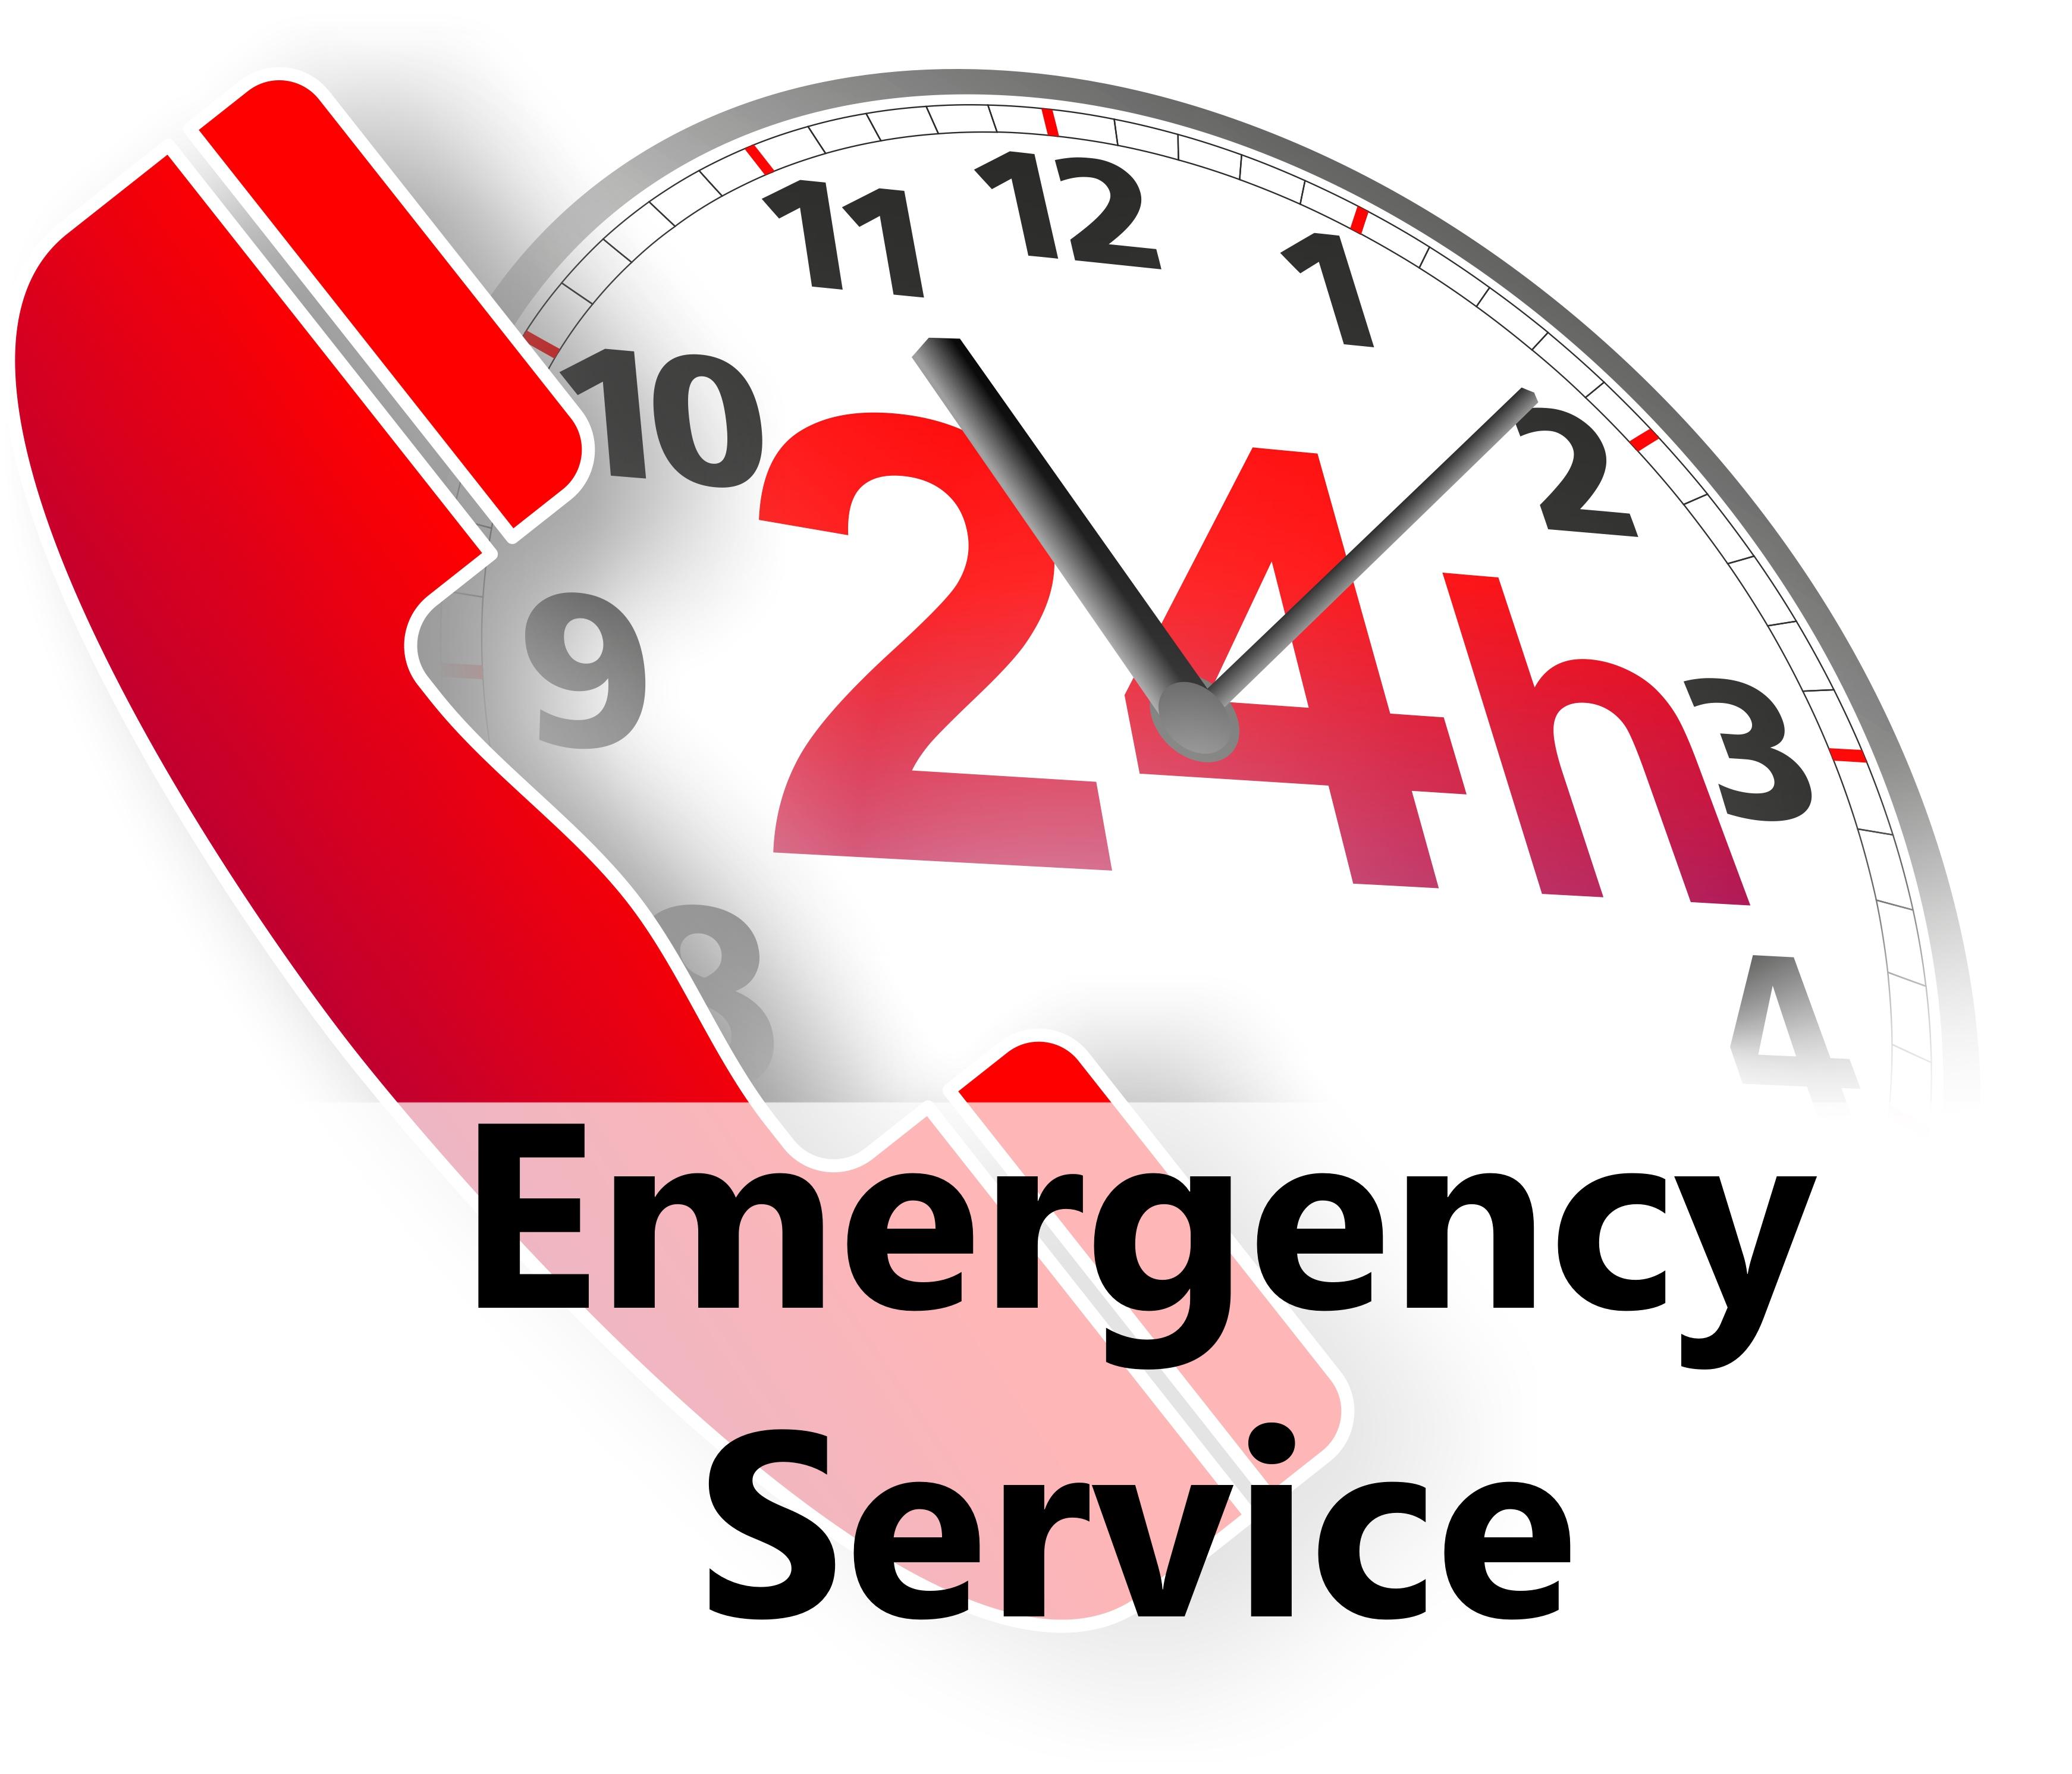 24hService